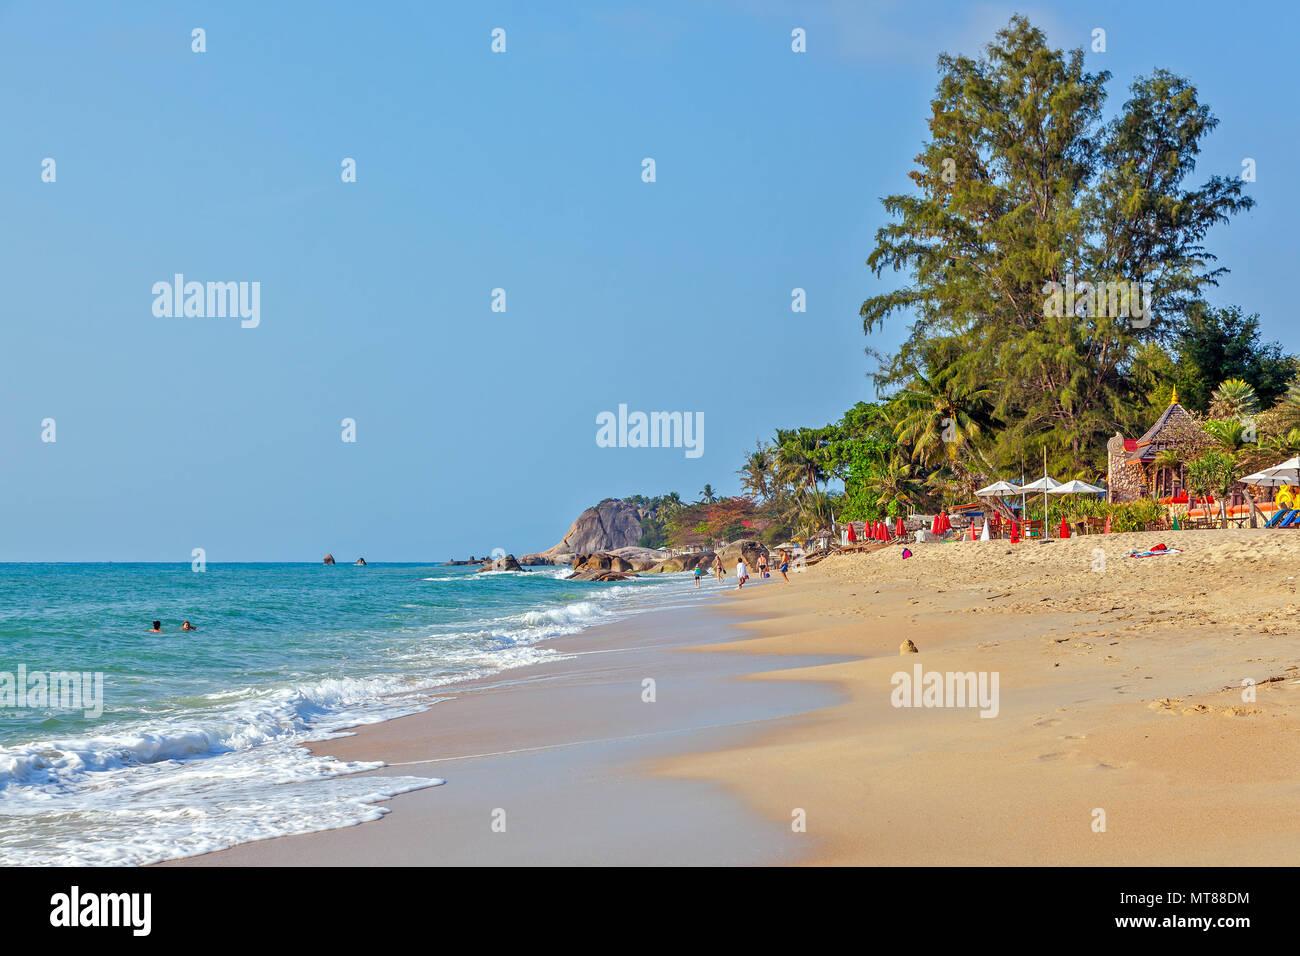 Sunny morning on Lamai beach. Koh Samui. Thailand. - Stock Image